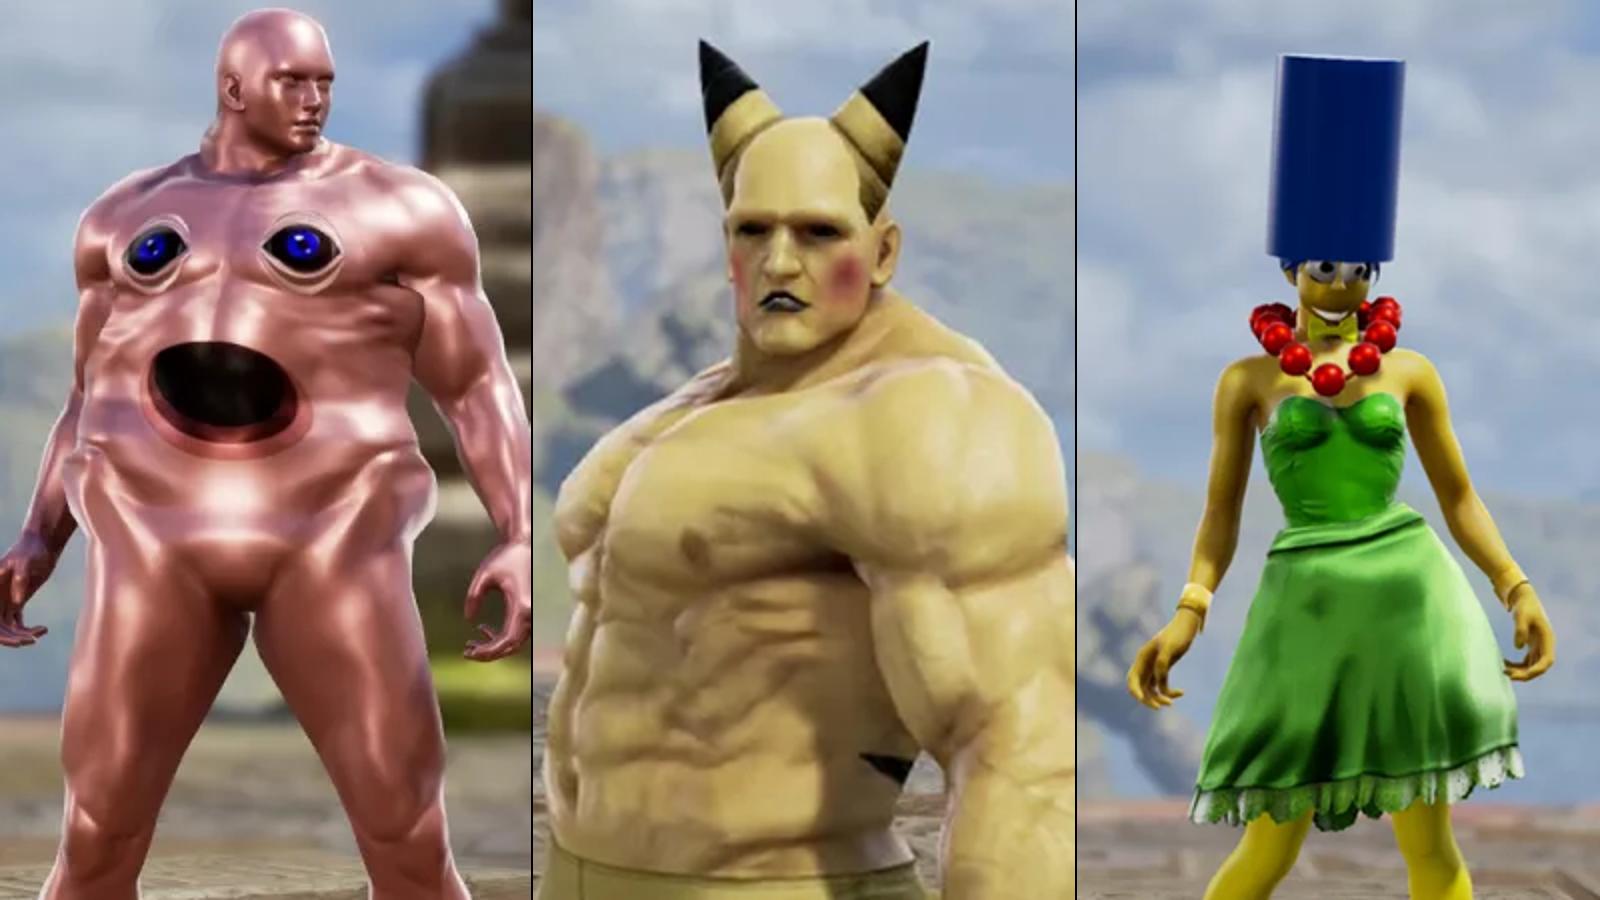 The Weirdest Soulcalibur VI Character Creations